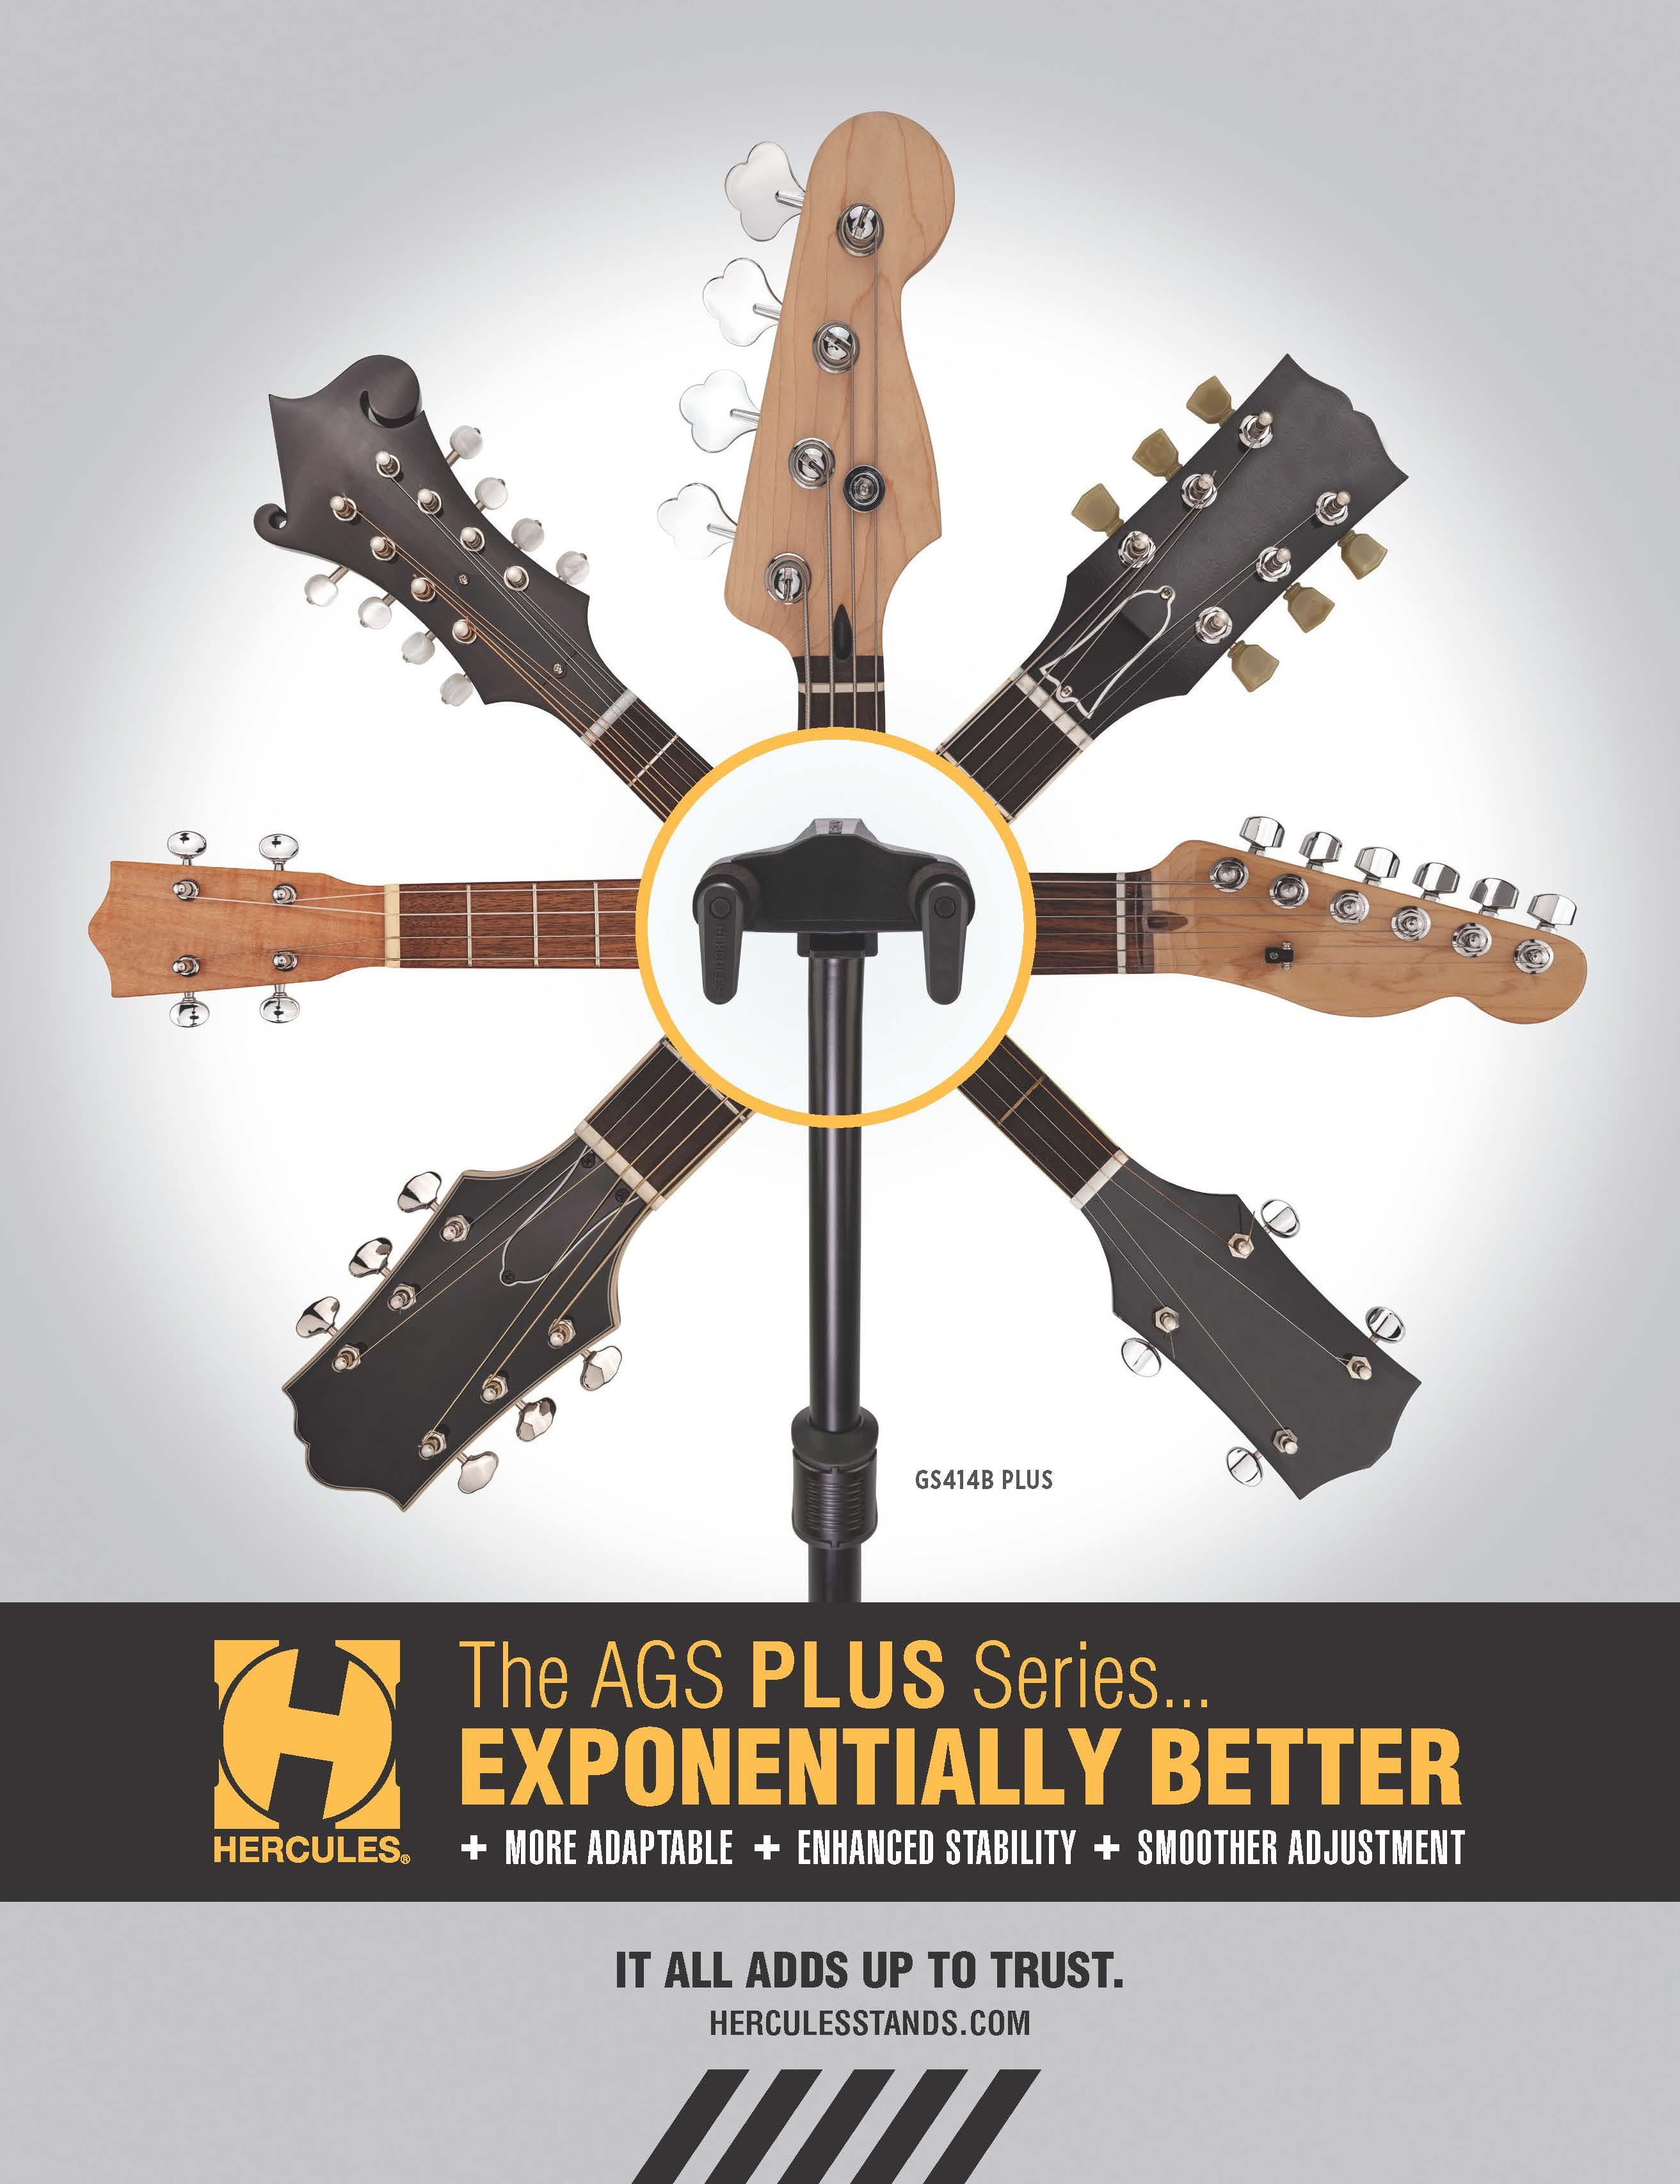 Hercules GSP40WBPLUS Plus Series Universal AutoGrip Wall Mount Guitar Hanger